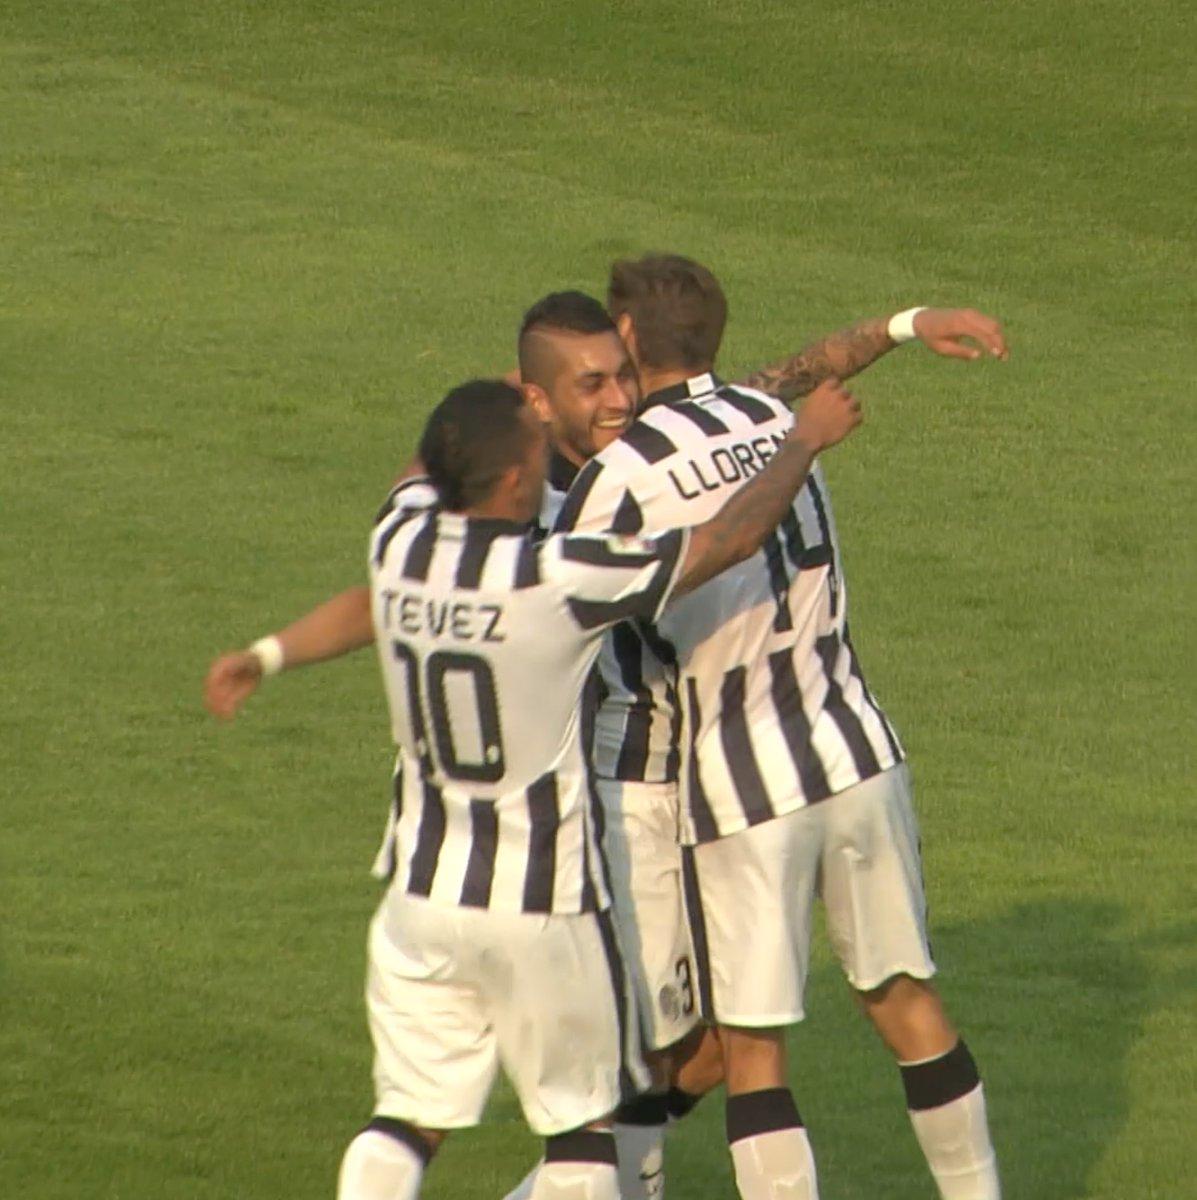 Nel sette!  #GoalOfTheDay ⚽️by El Tucu #Pereyra! https://t.co/v0M8YZYRrd